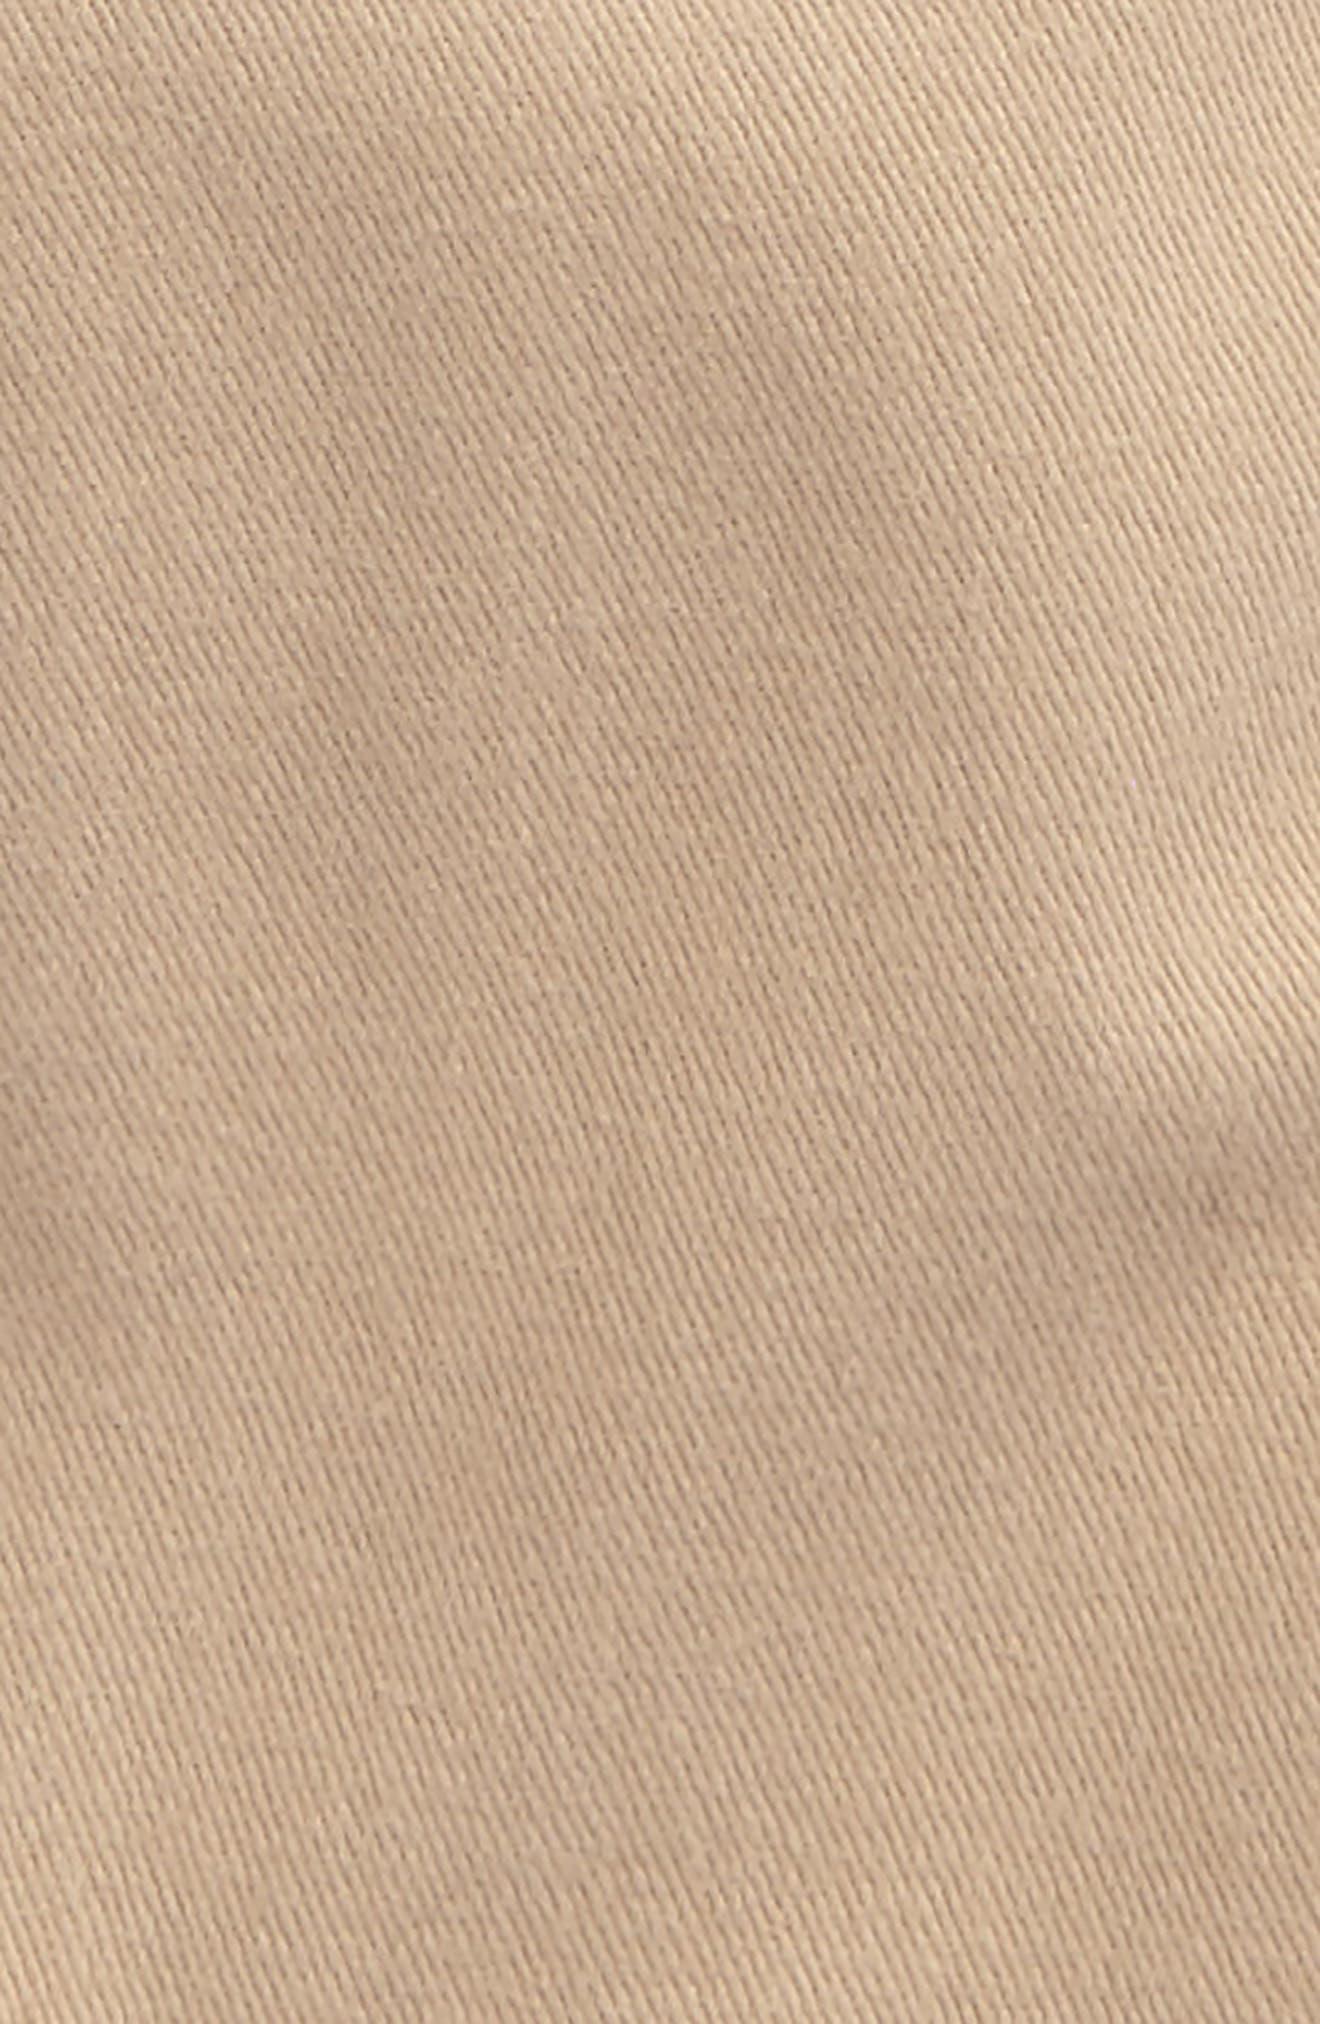 Stretch Cotton Twill Pants,                             Alternate thumbnail 2, color,                             260